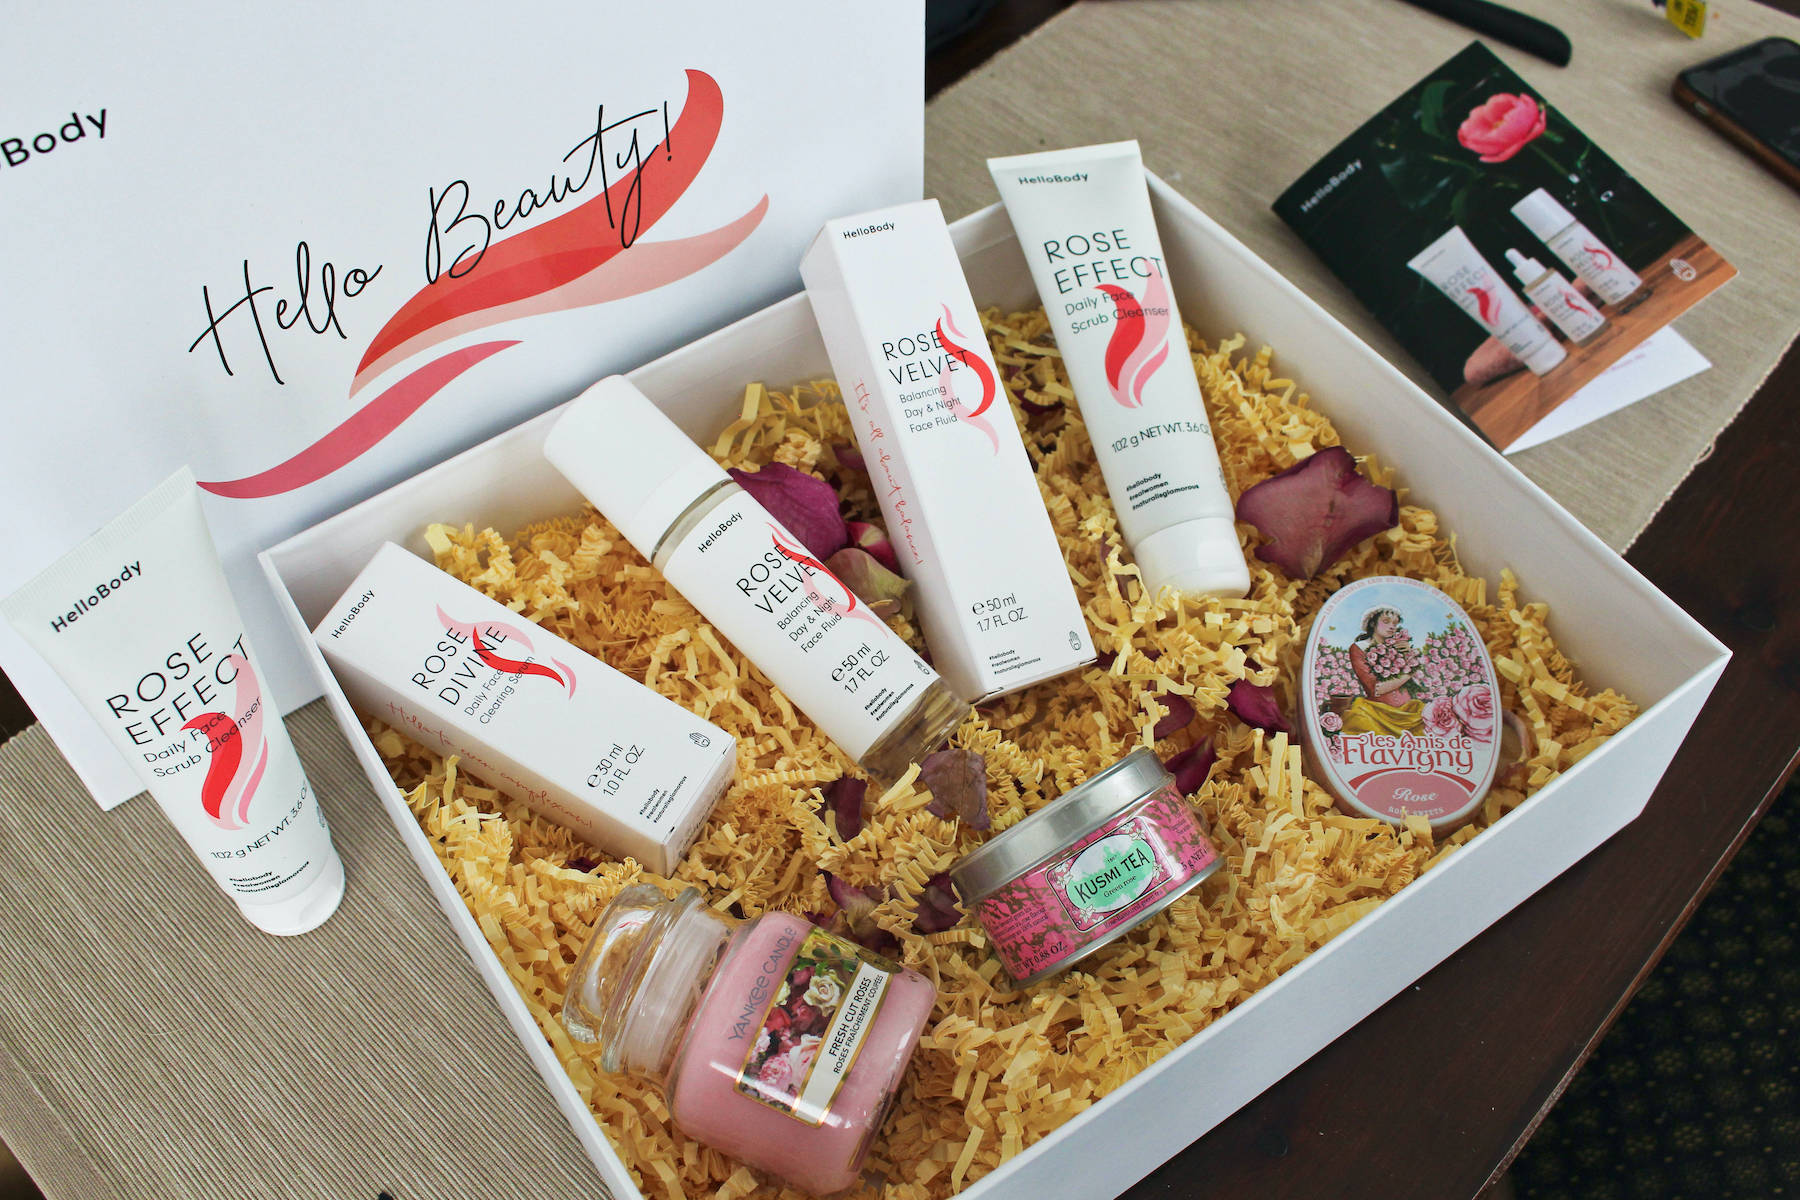 Hello Body Rose Linie Unboxing PR Sample Box beautycatze